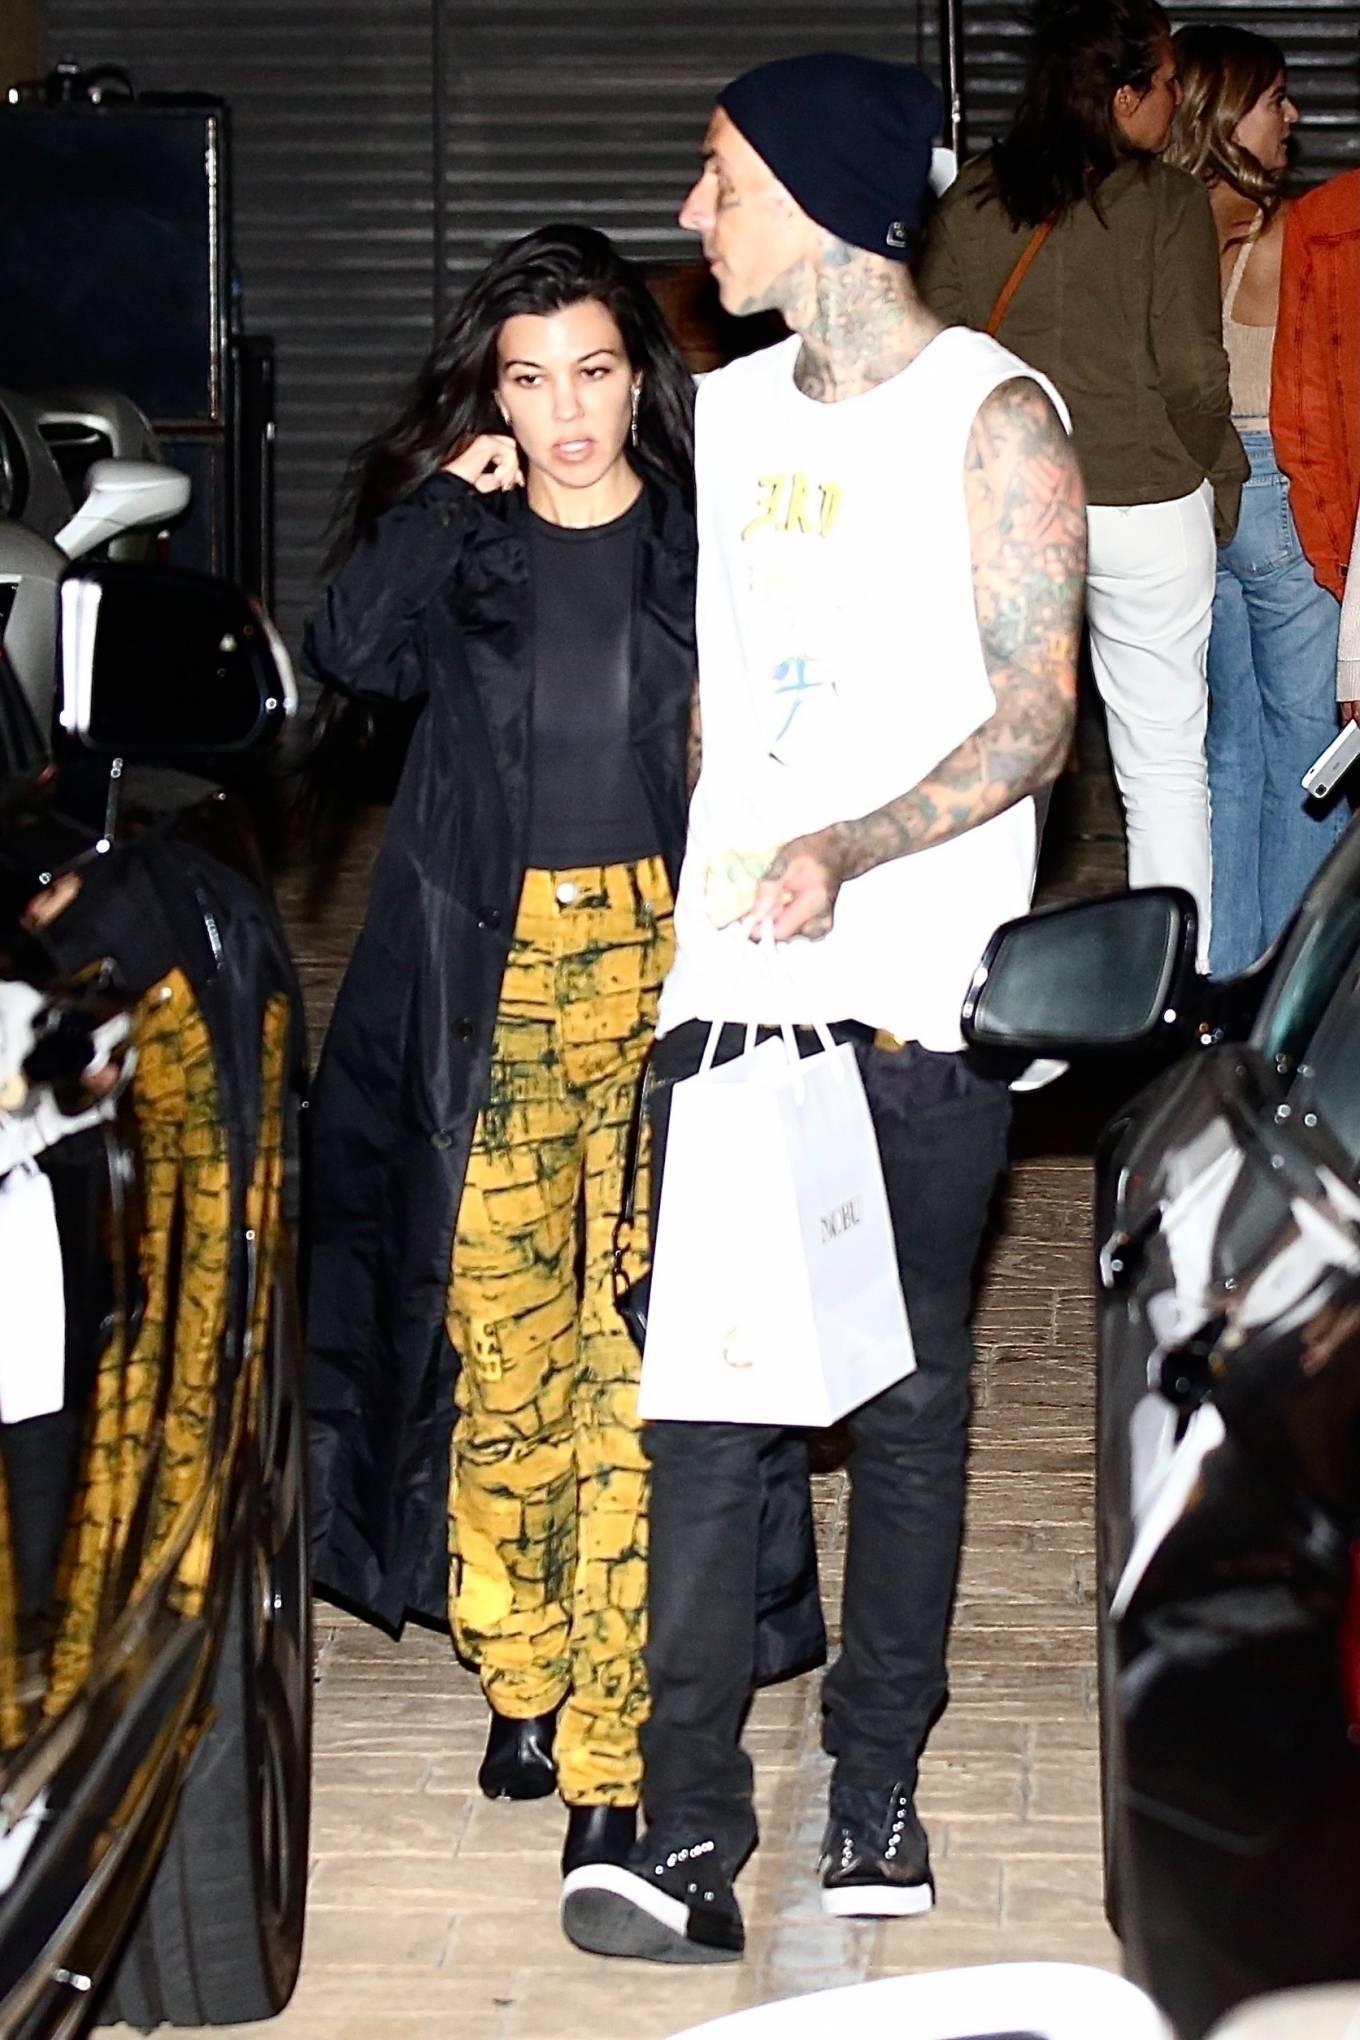 Kourtney Kardashian 2021 : Kourtney Kardashian – With boyfriend Travis Barker seen at Nobu in Malibu-01